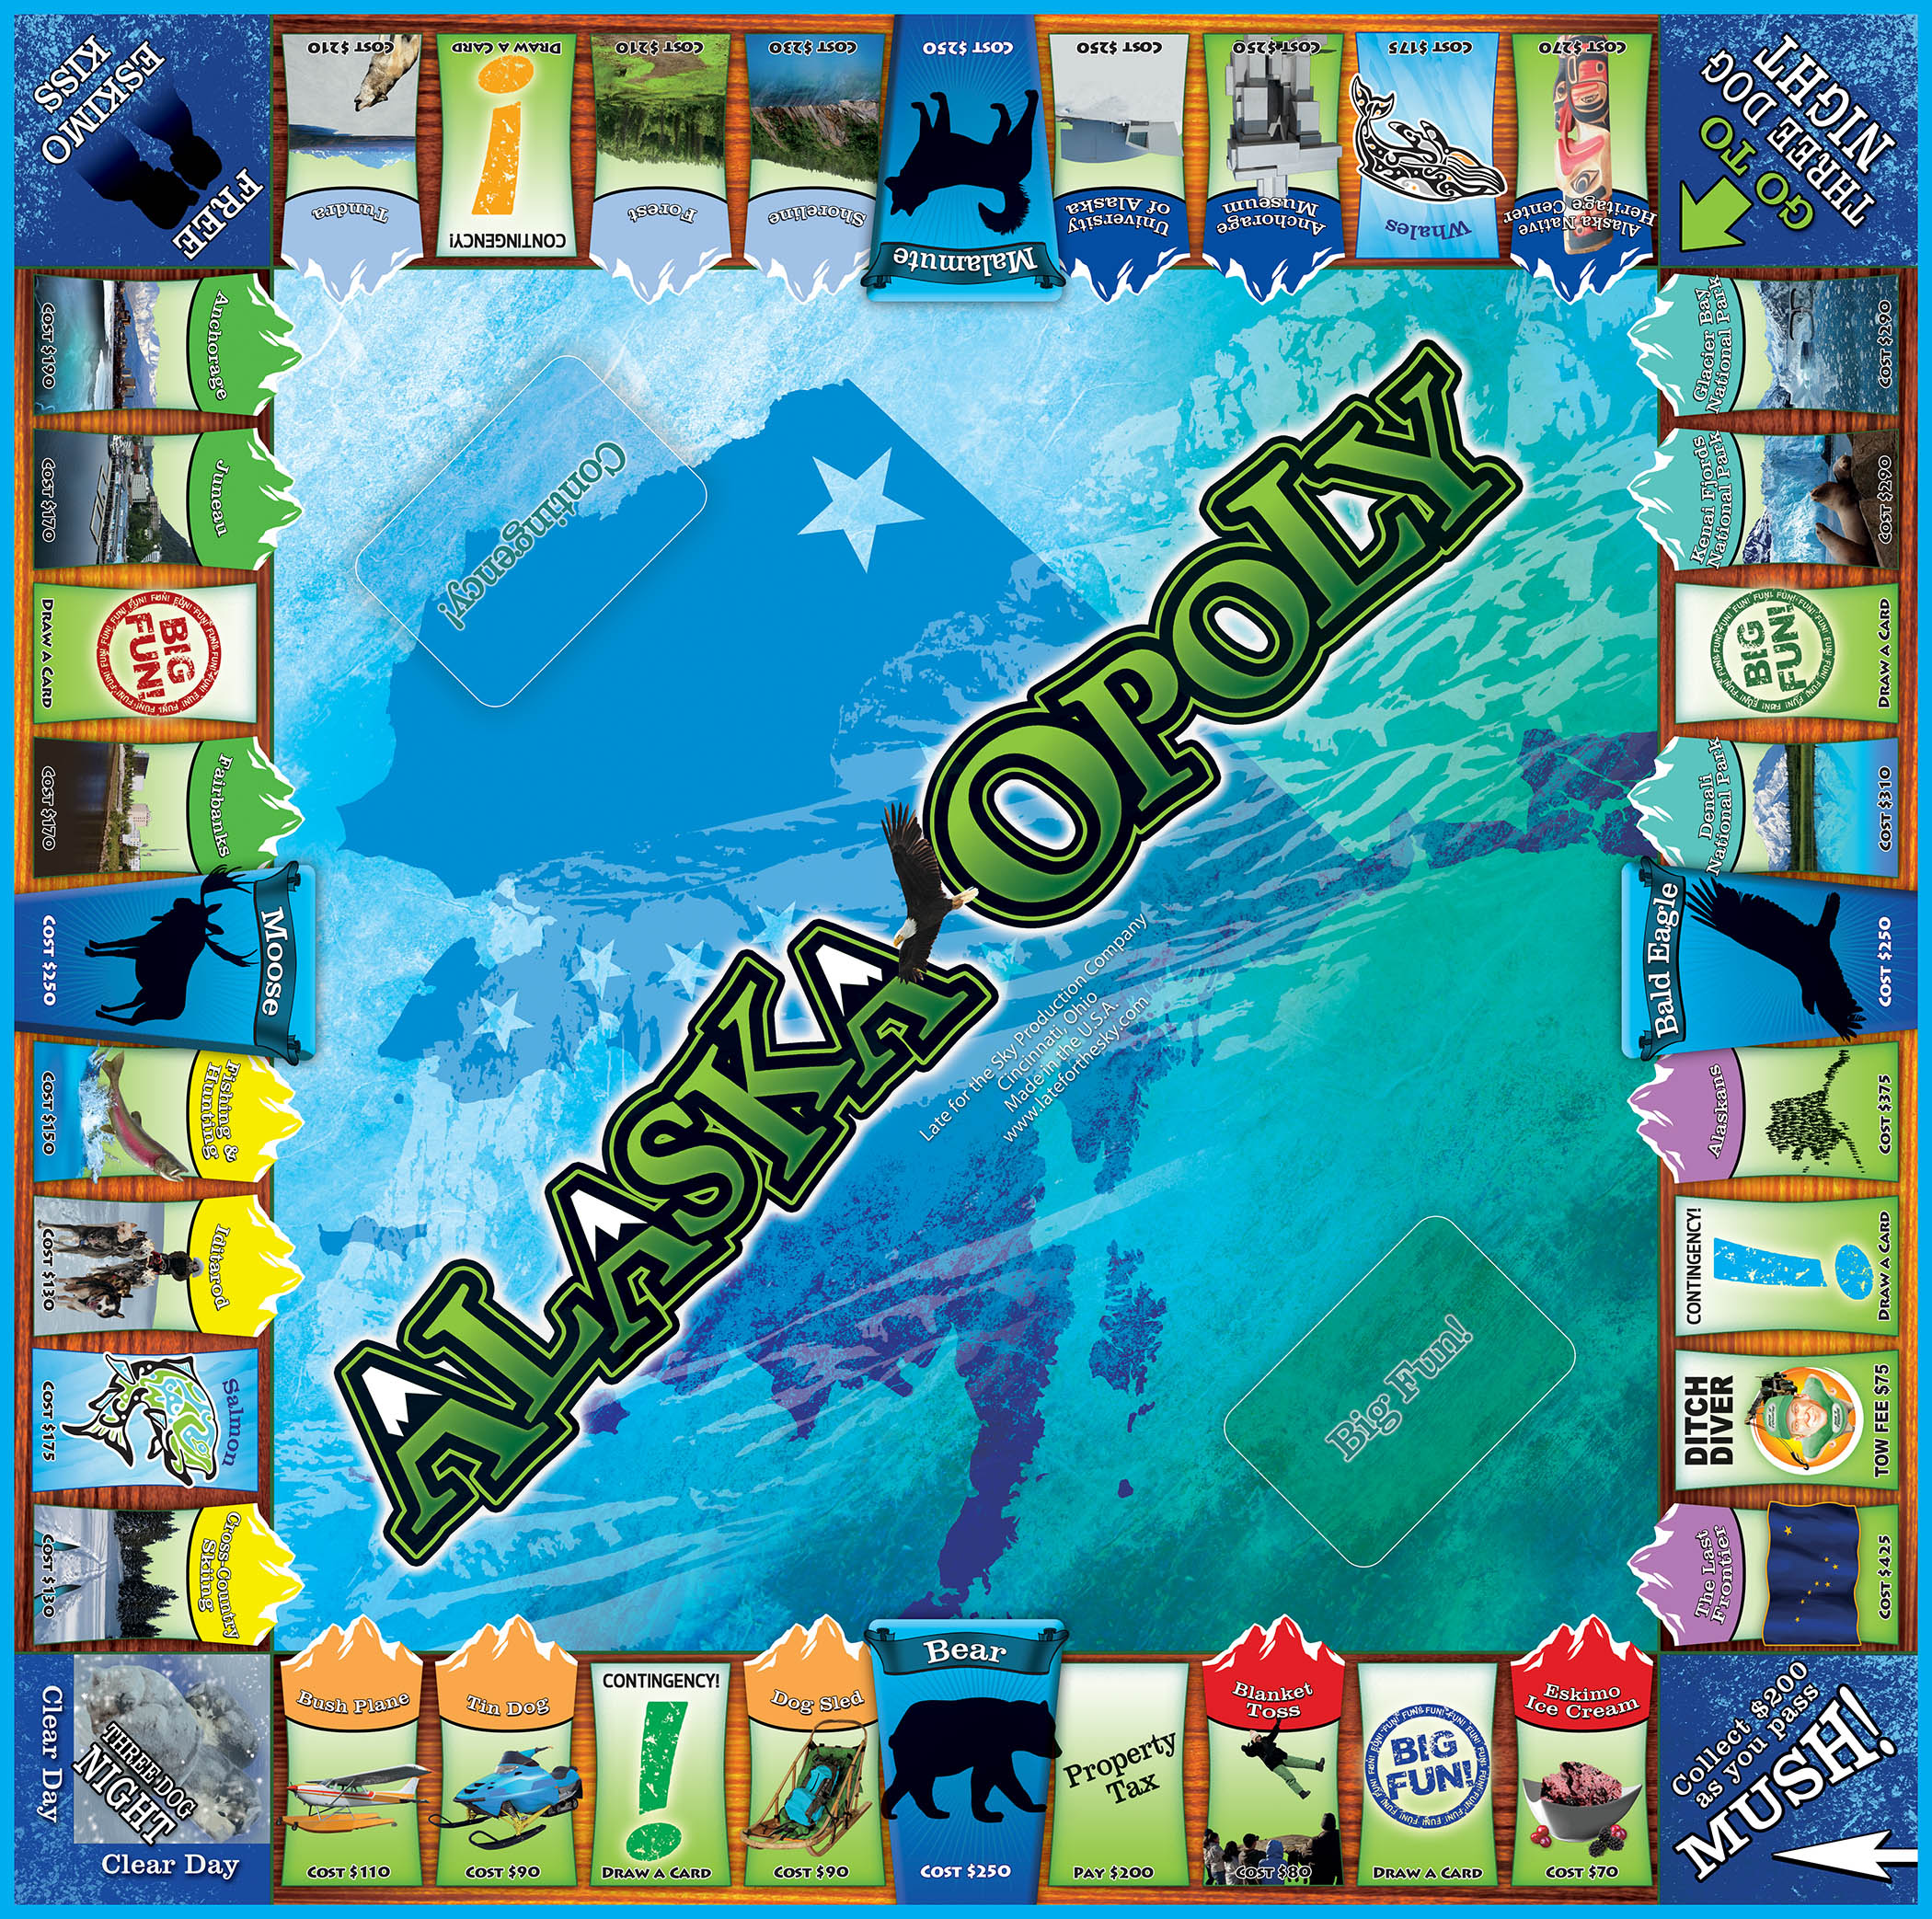 ALASKA-OPOLY Board Game